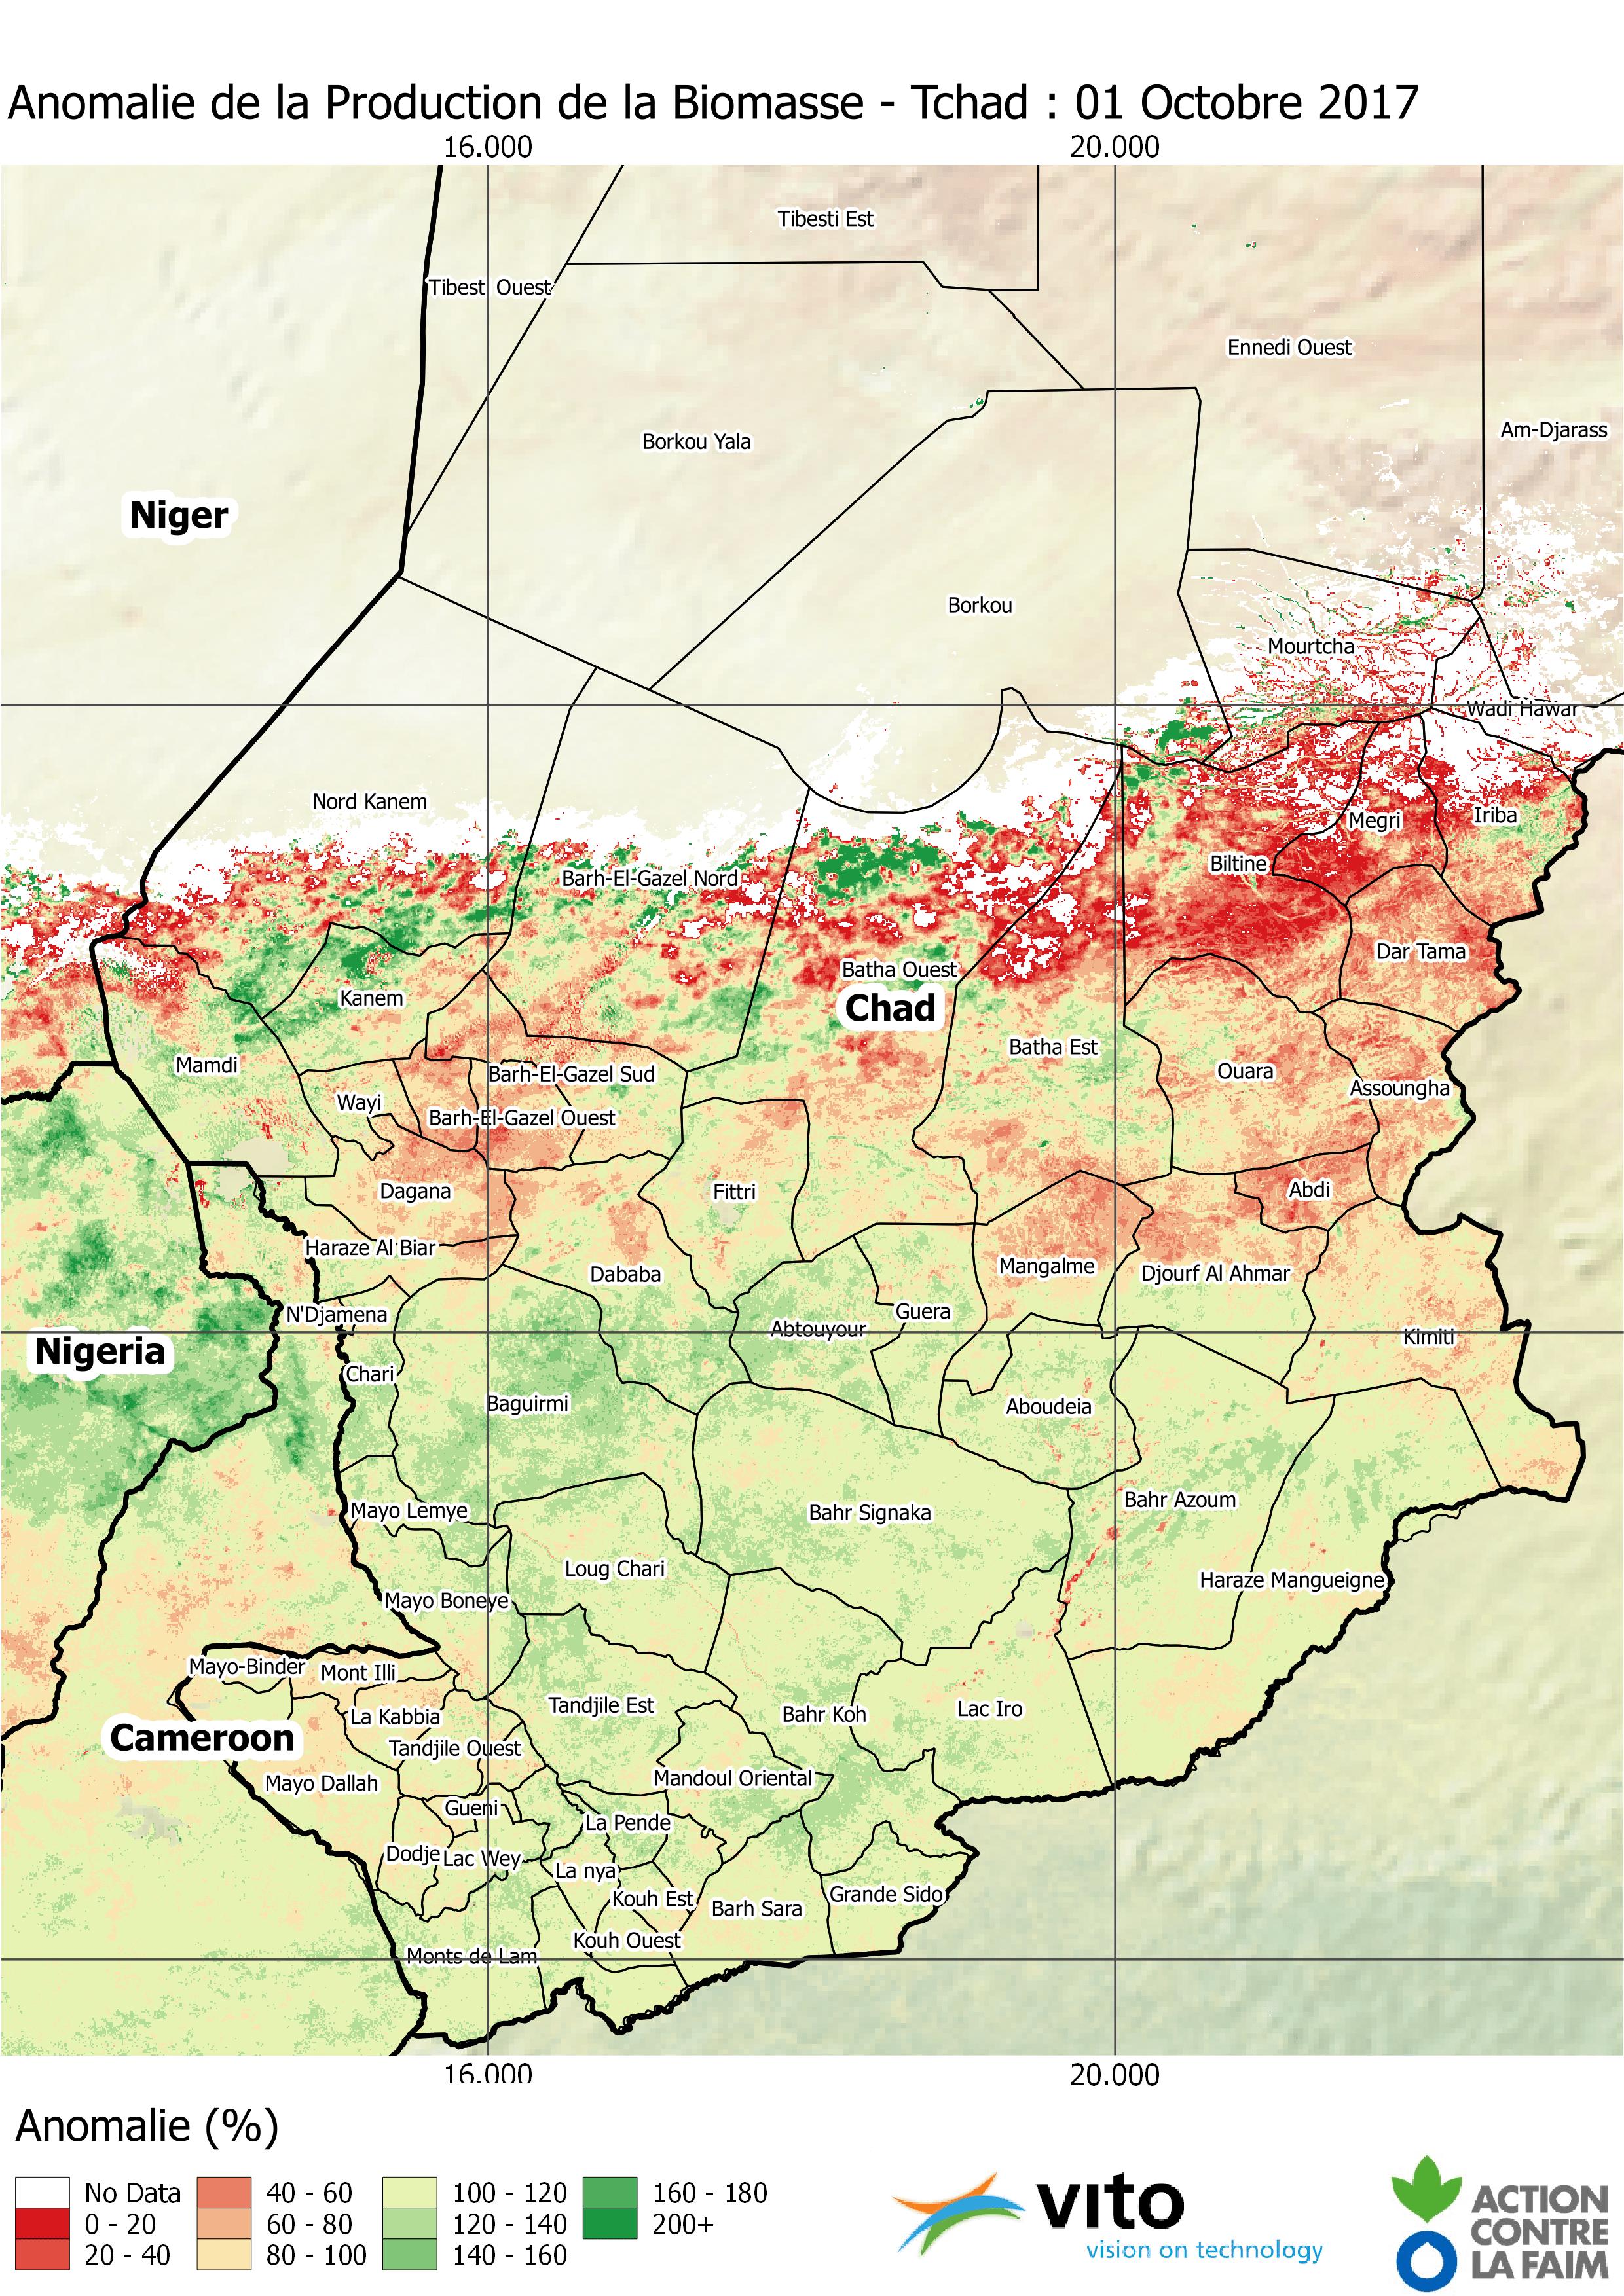 Anomalie Tchad 2017